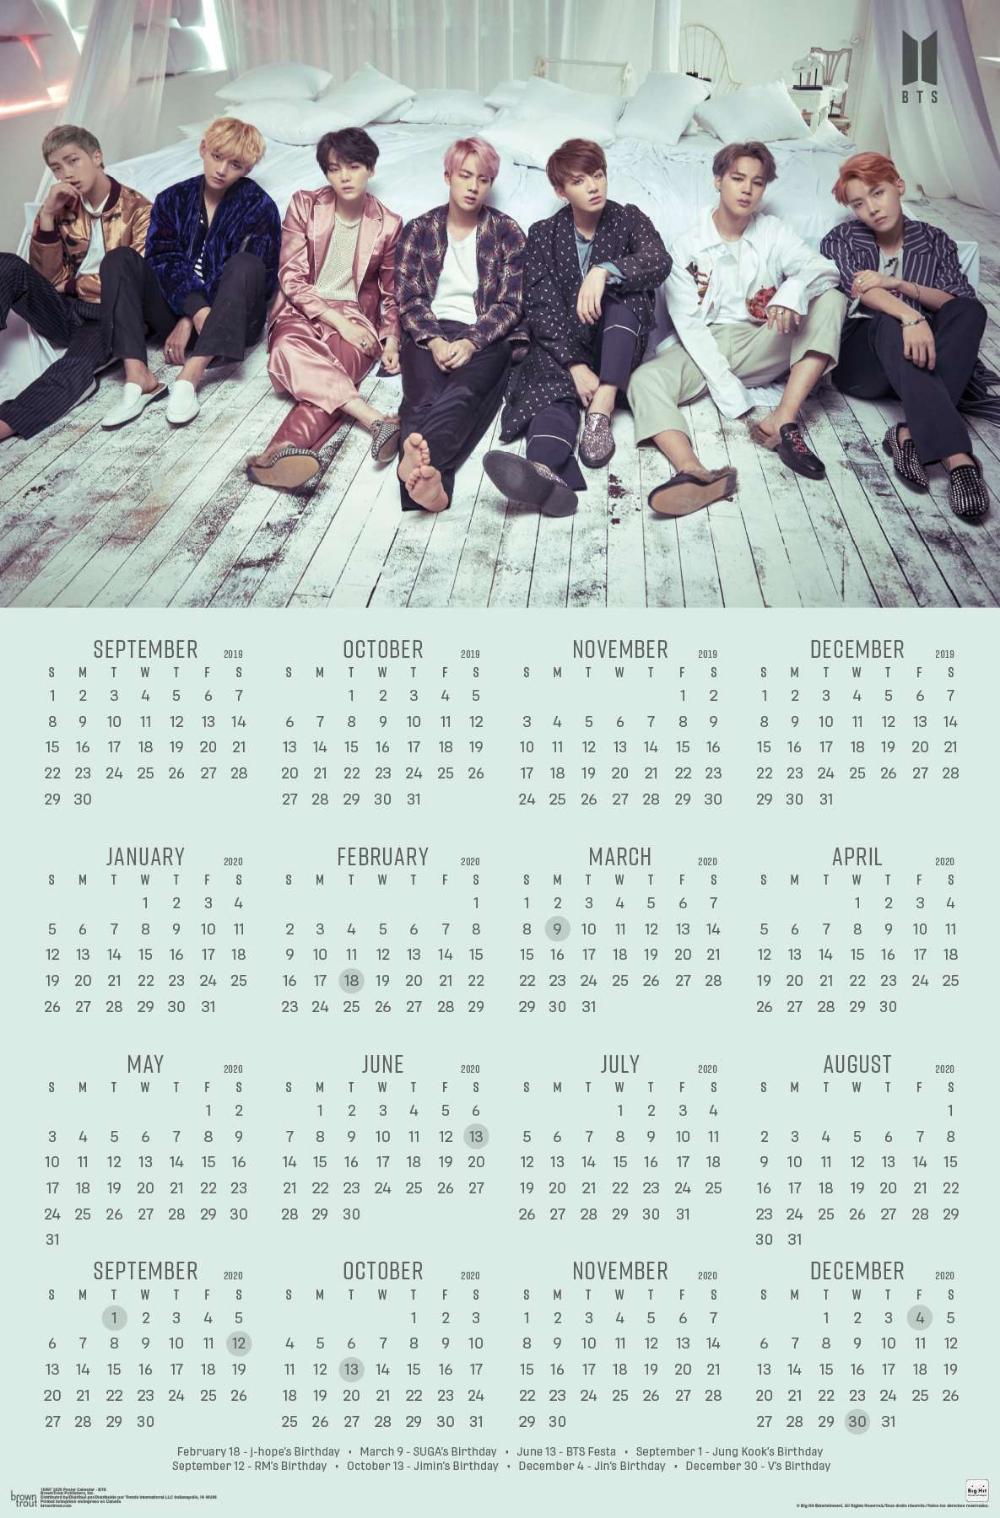 2020 Poster Calendar - Bts In 2019 | Bts Calendar, Bts, Calendar